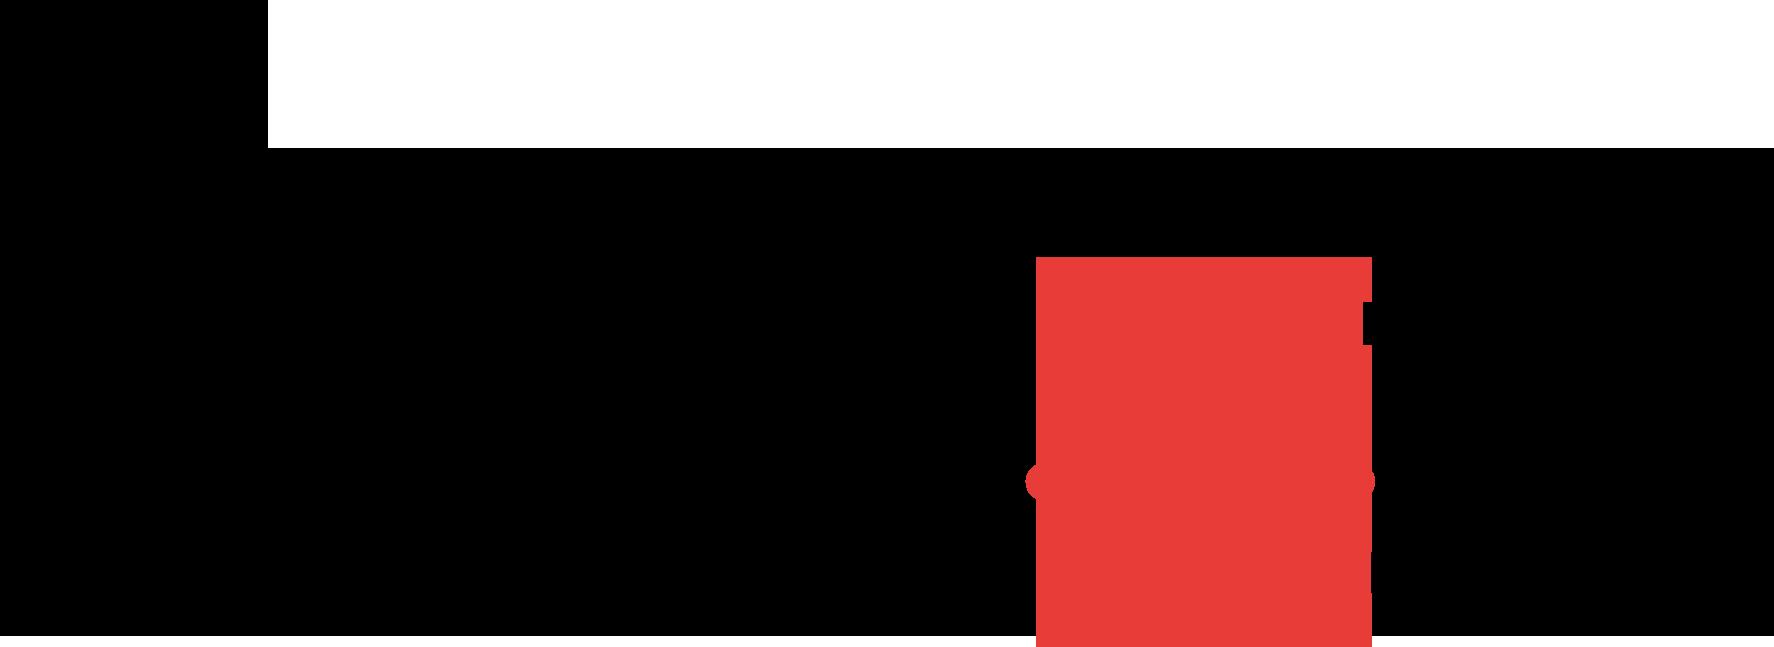 ieasoft logo